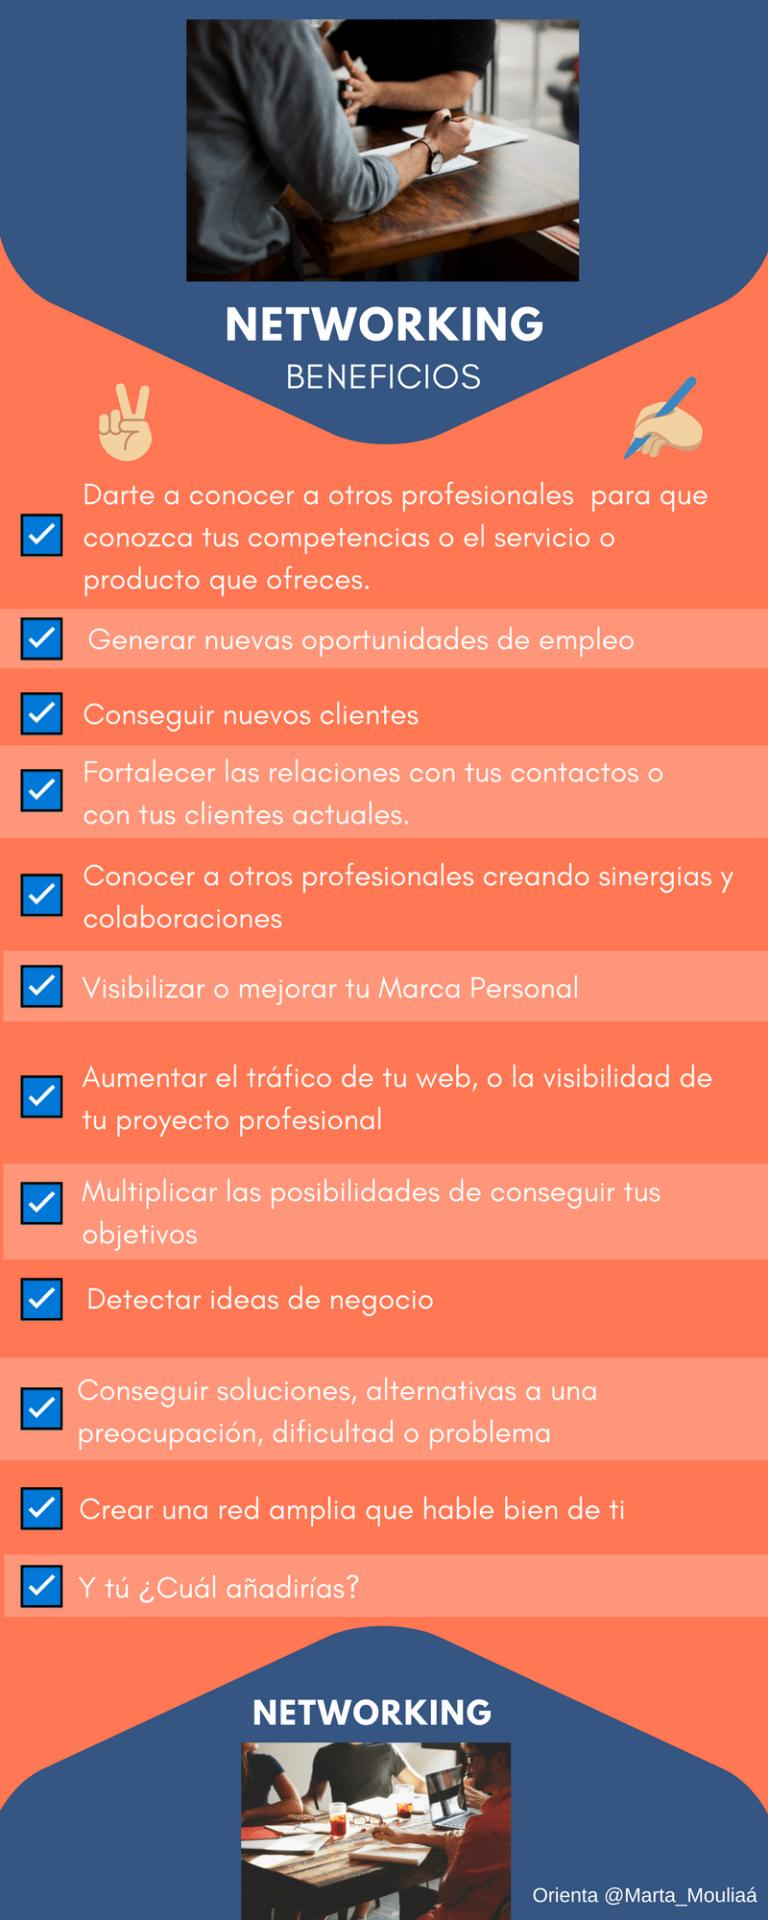 Infografia - Guía de Networking para Dummies - Orienta Marta Mouliaá